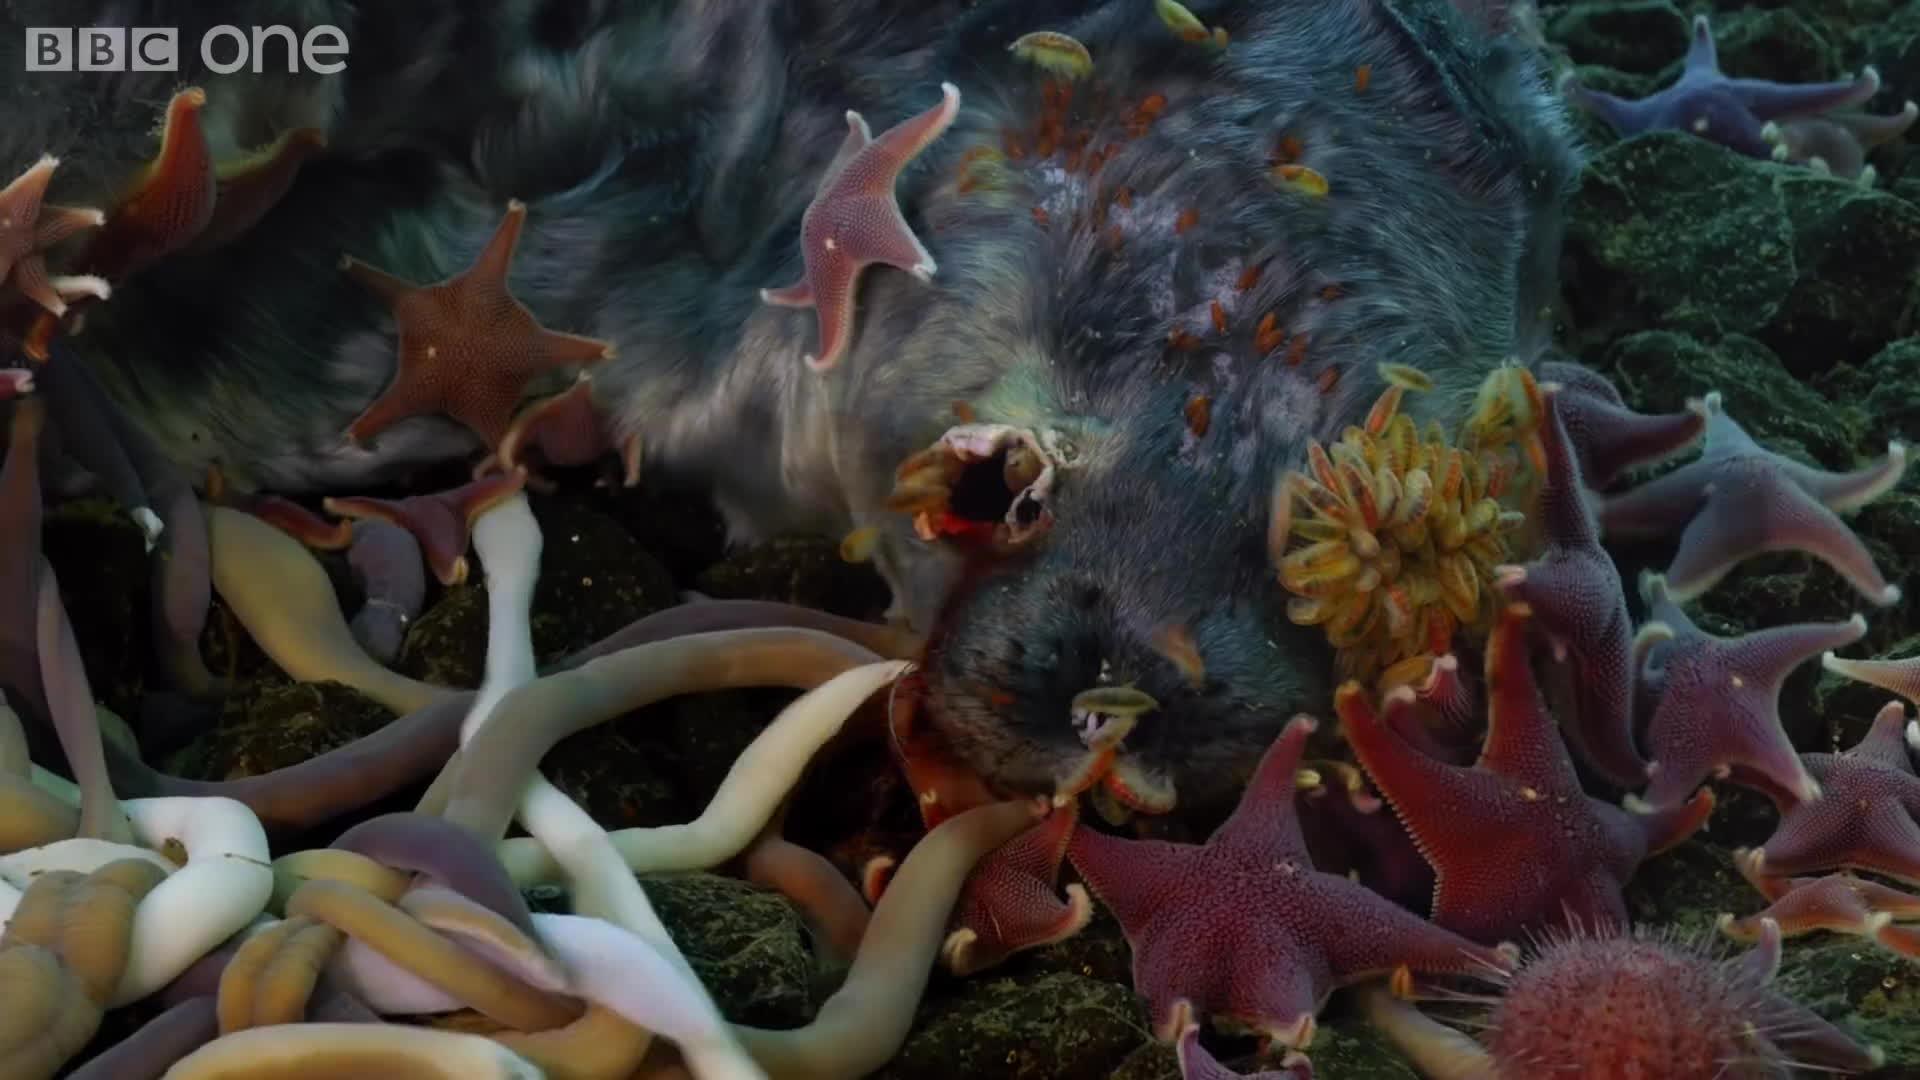 natureismetal, Timelapse: Sea creatures feasting GIFs